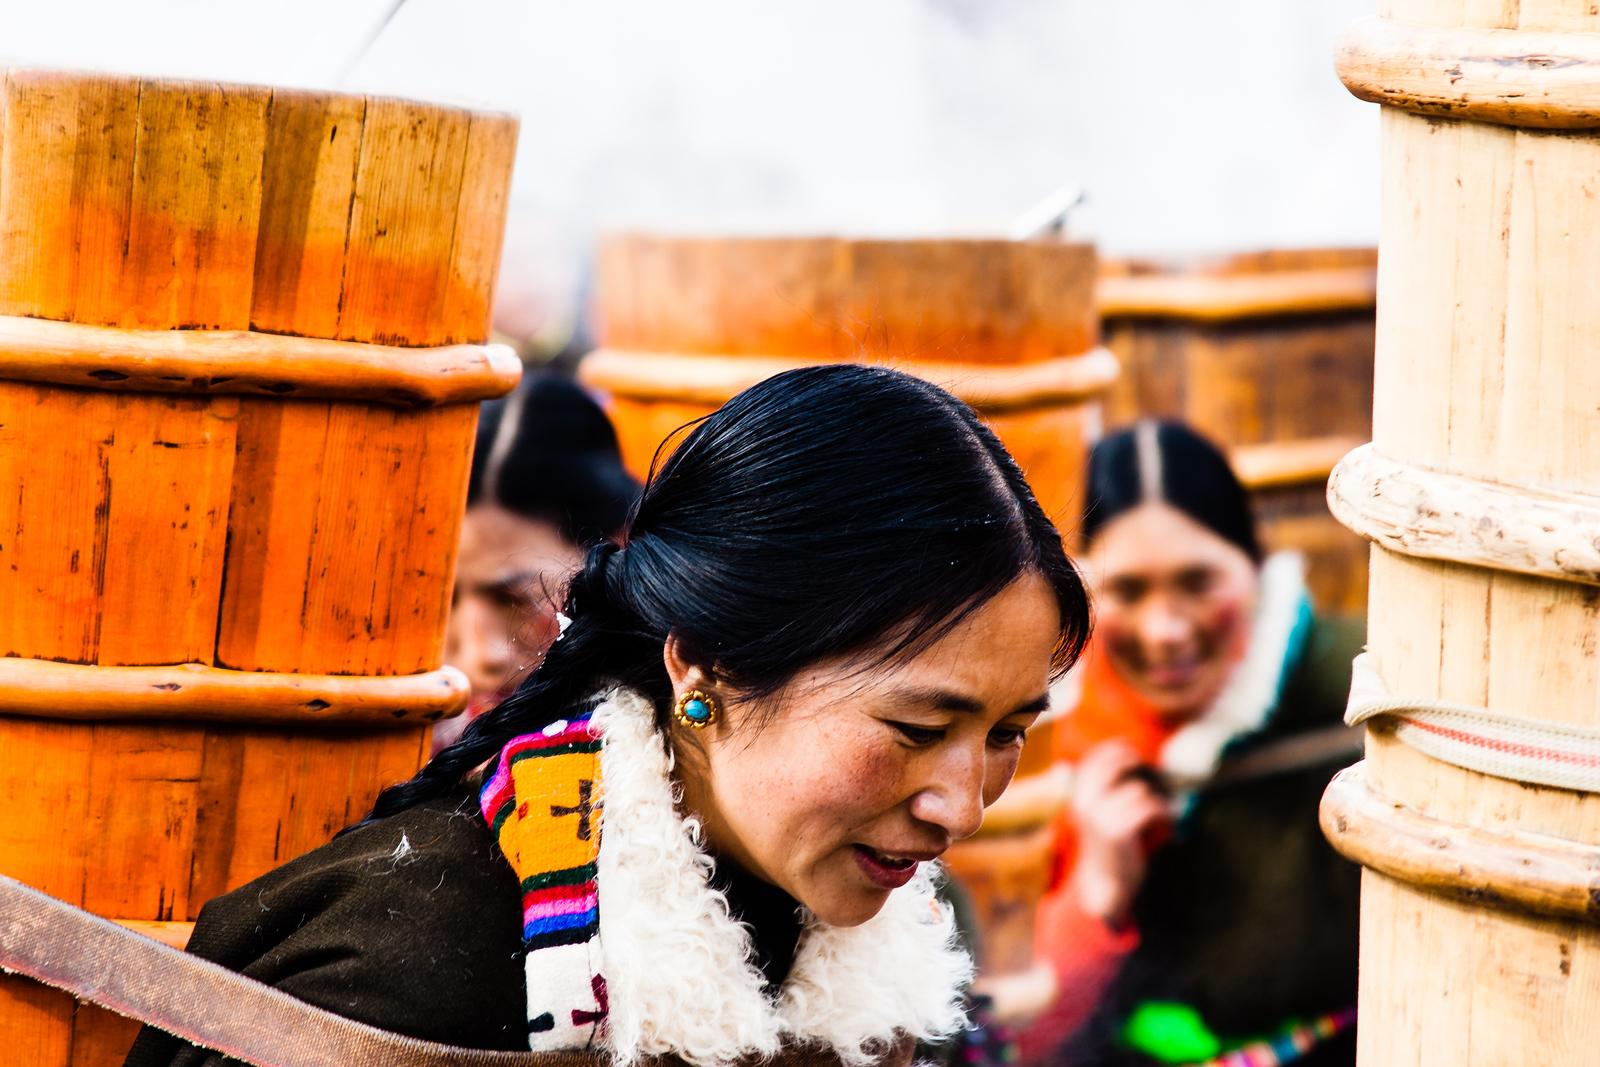 The Tibetan women carry the butter tea in huge water barrels slung on their backs.